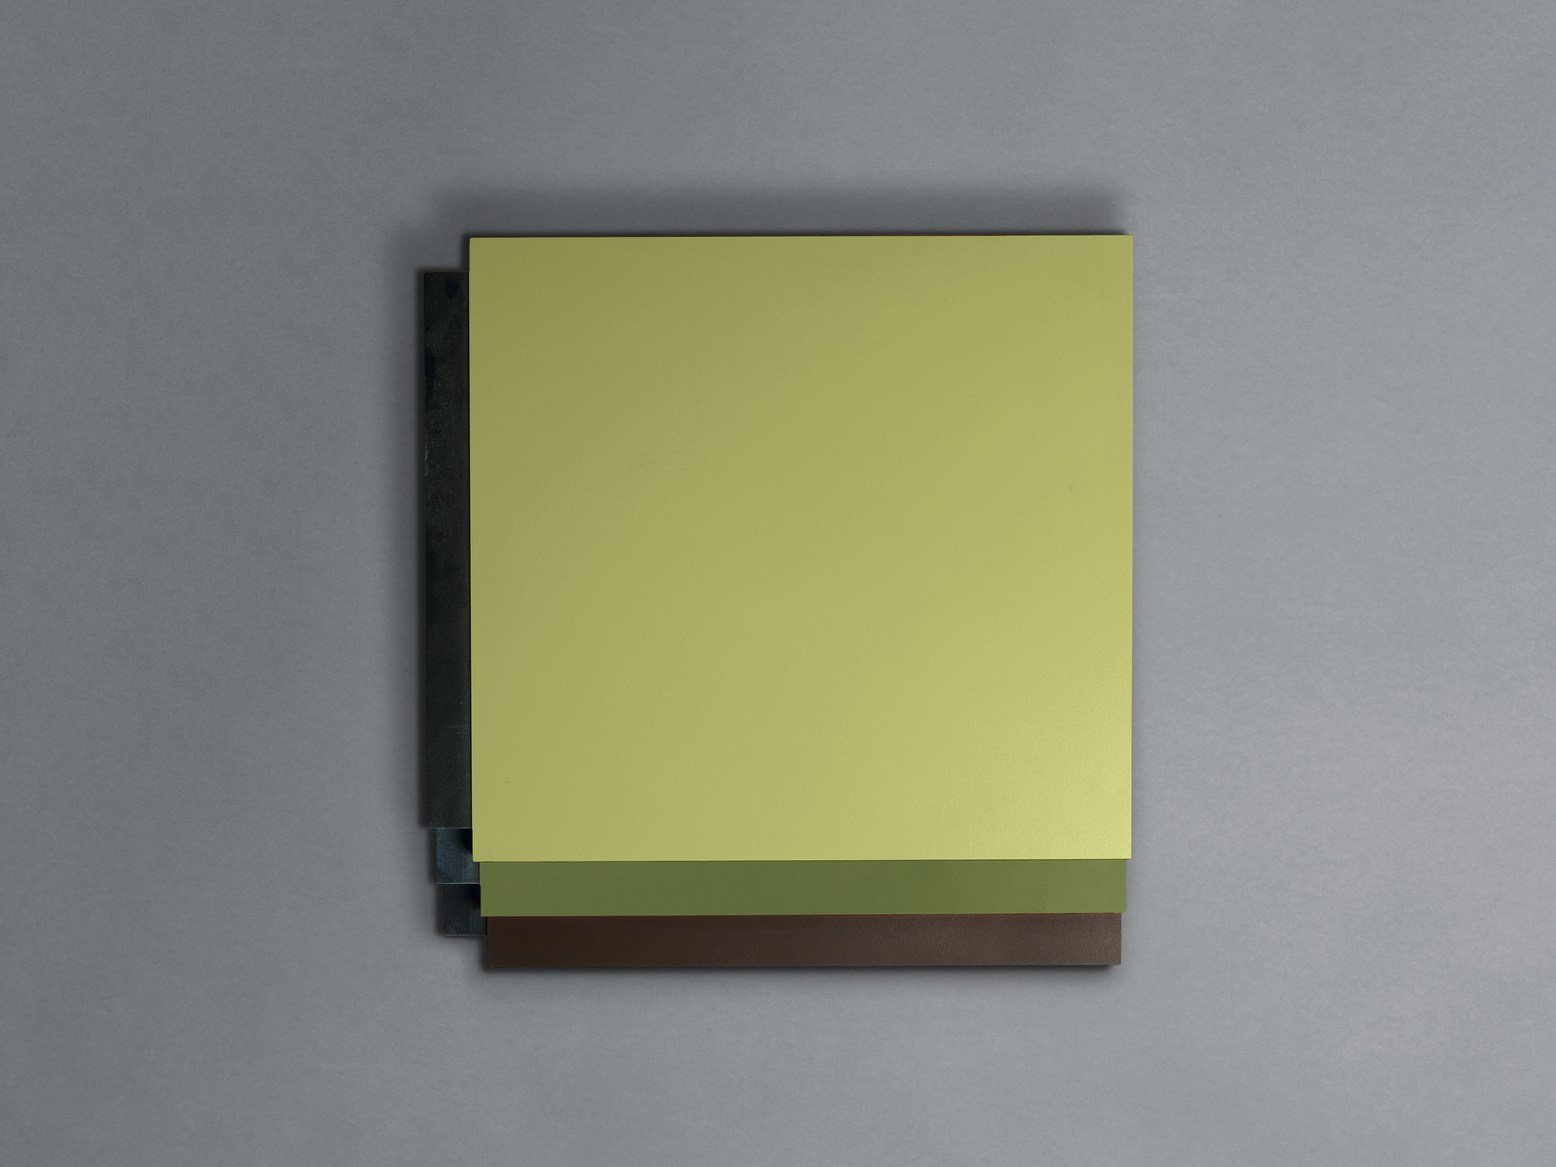 S900 sitzbank aus holz by janua design sophia cassina seipp